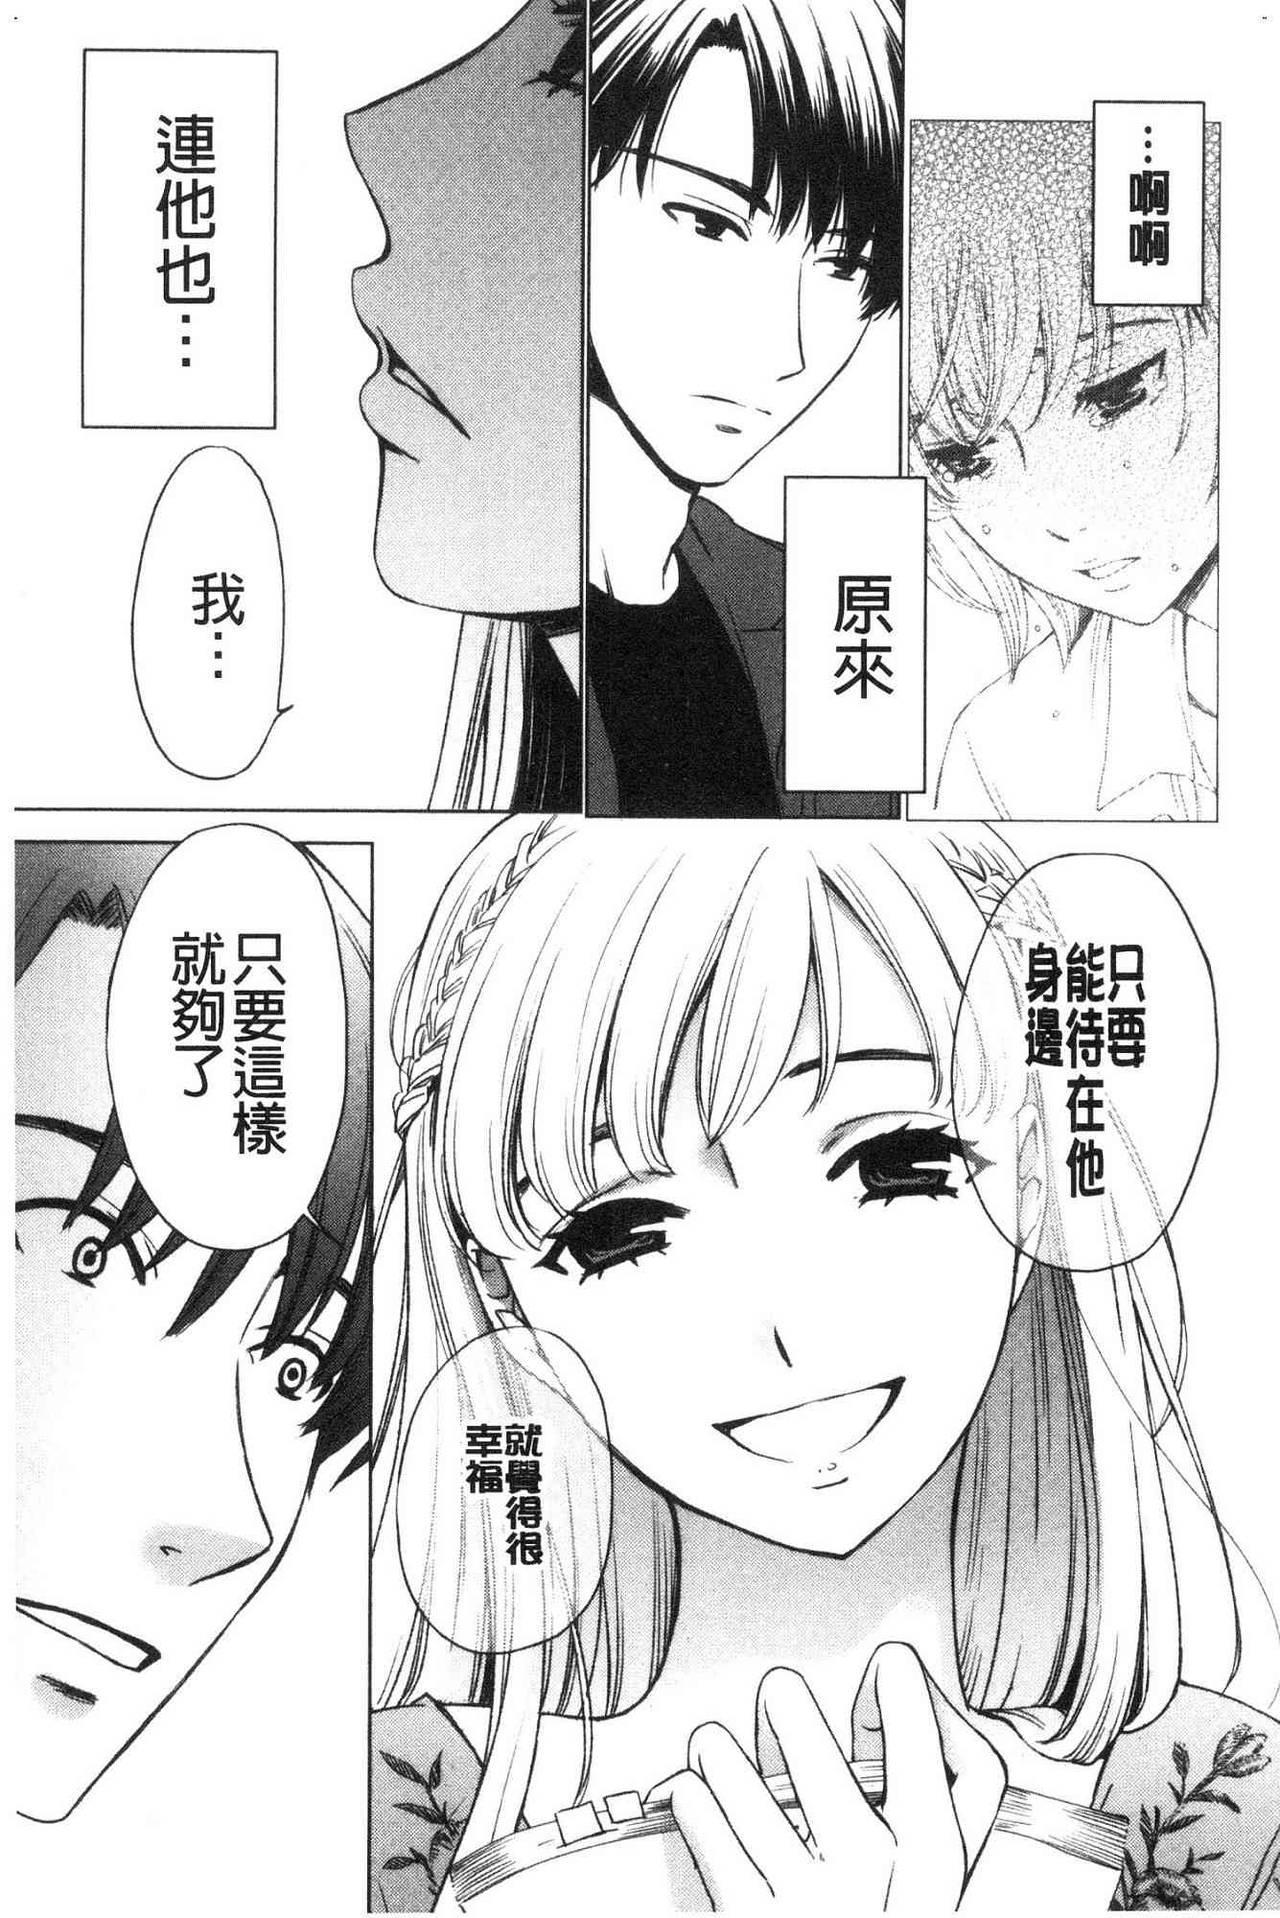 [Gotoh Akira]  21-ji no Onna ~Camera no Mae no Mesuinu~ 2 | 21時之女 ~鏡頭前的牝犬~ 2 [Chinese] 148